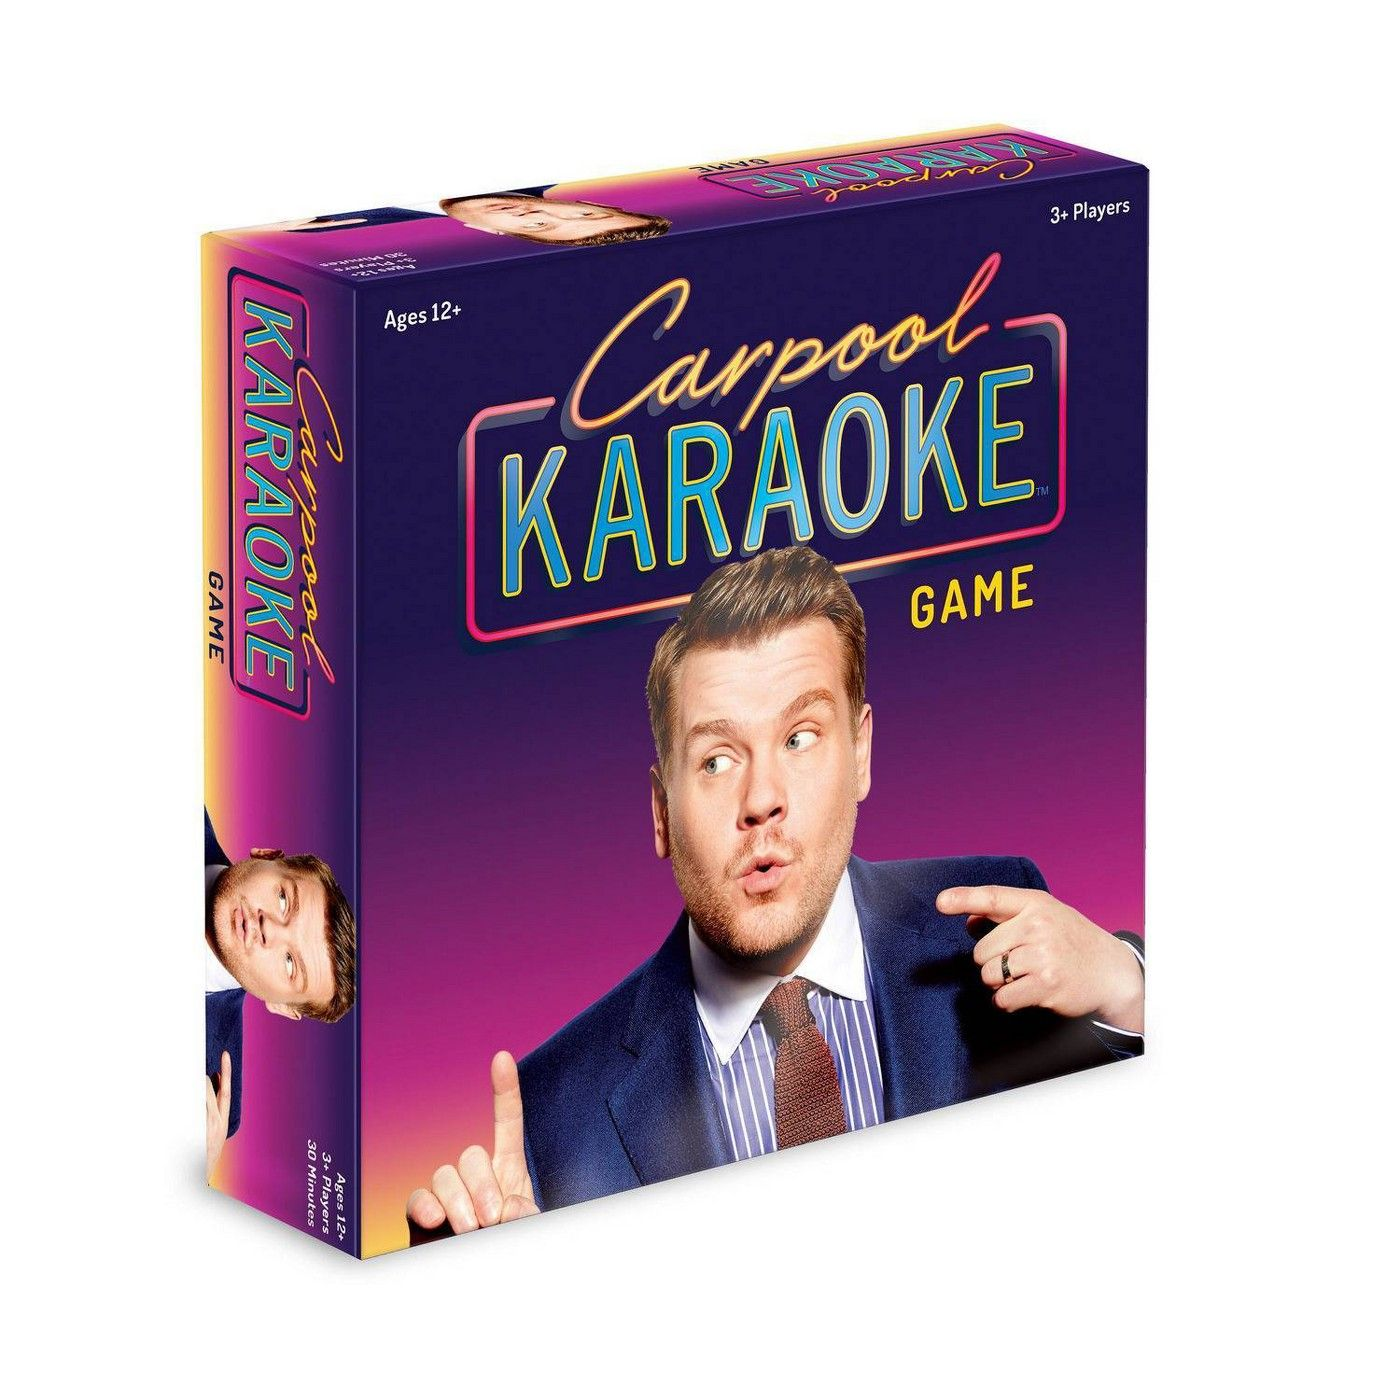 James Corden Carpool Karaoke Board Game #Affiliate #Carpool, #ad, #Corden, #James